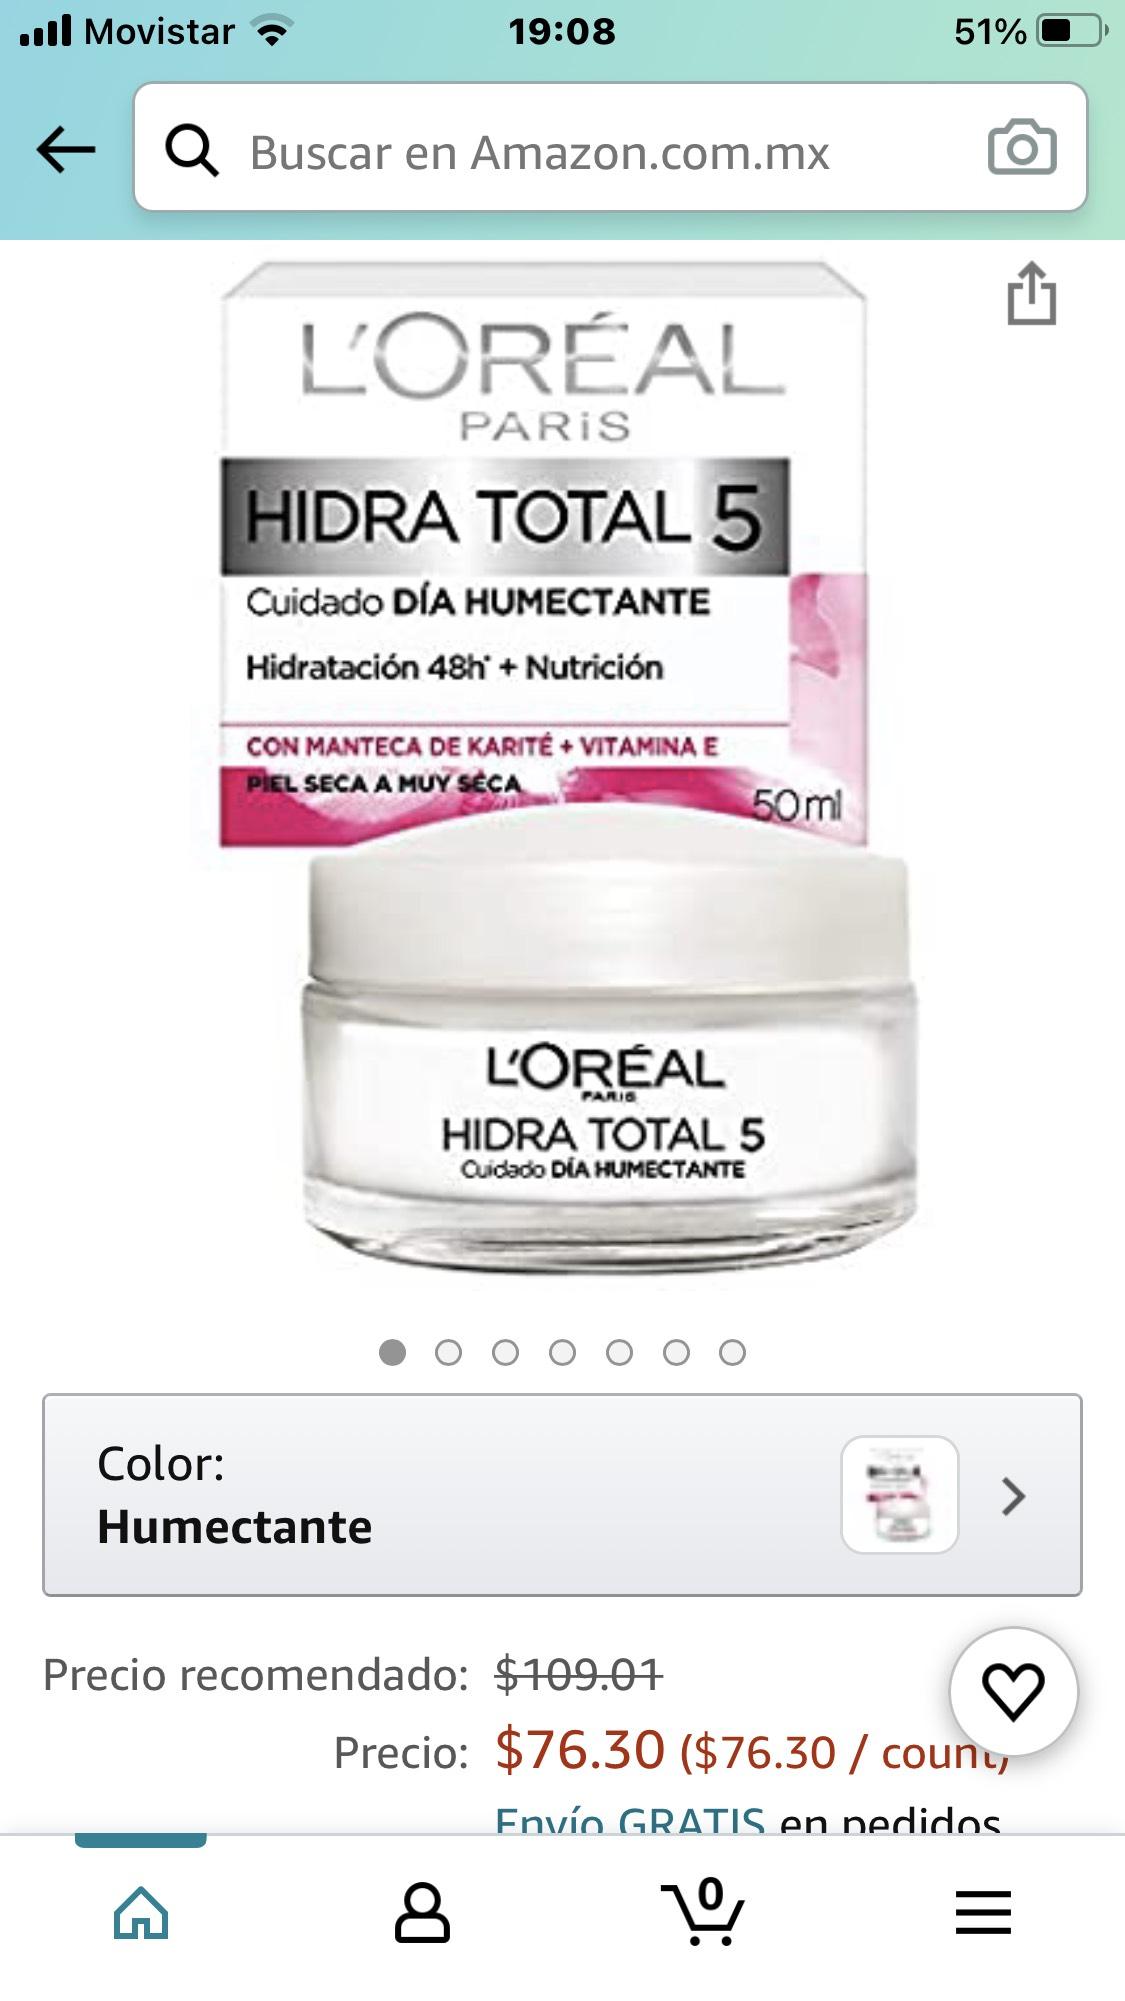 Amazon: Crema hidratotal L'Oréal